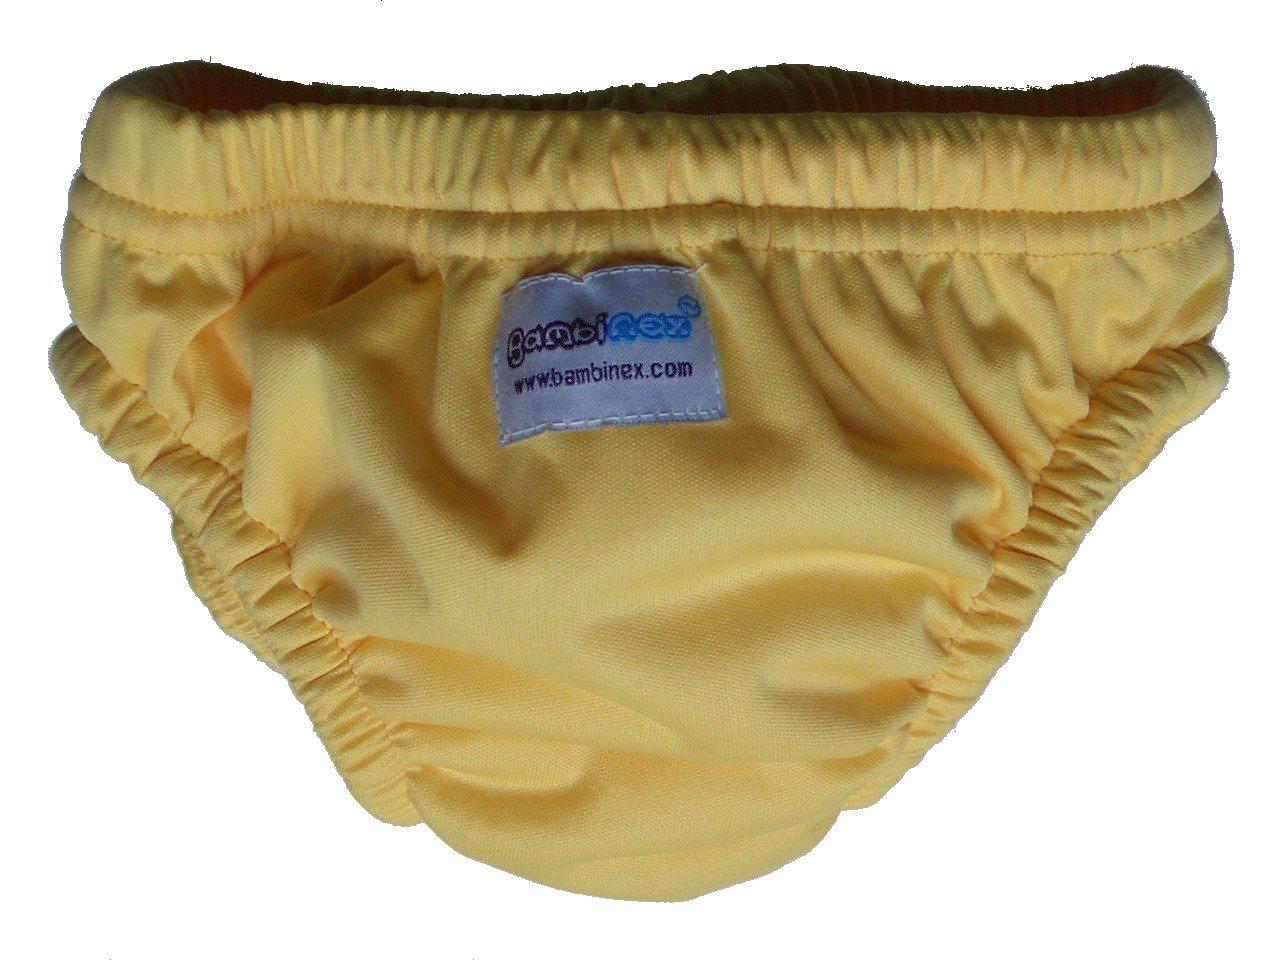 Bambinex 031850YE - Pañal de natación, talla pequeña, color amarillo: Amazon.es: Bebé